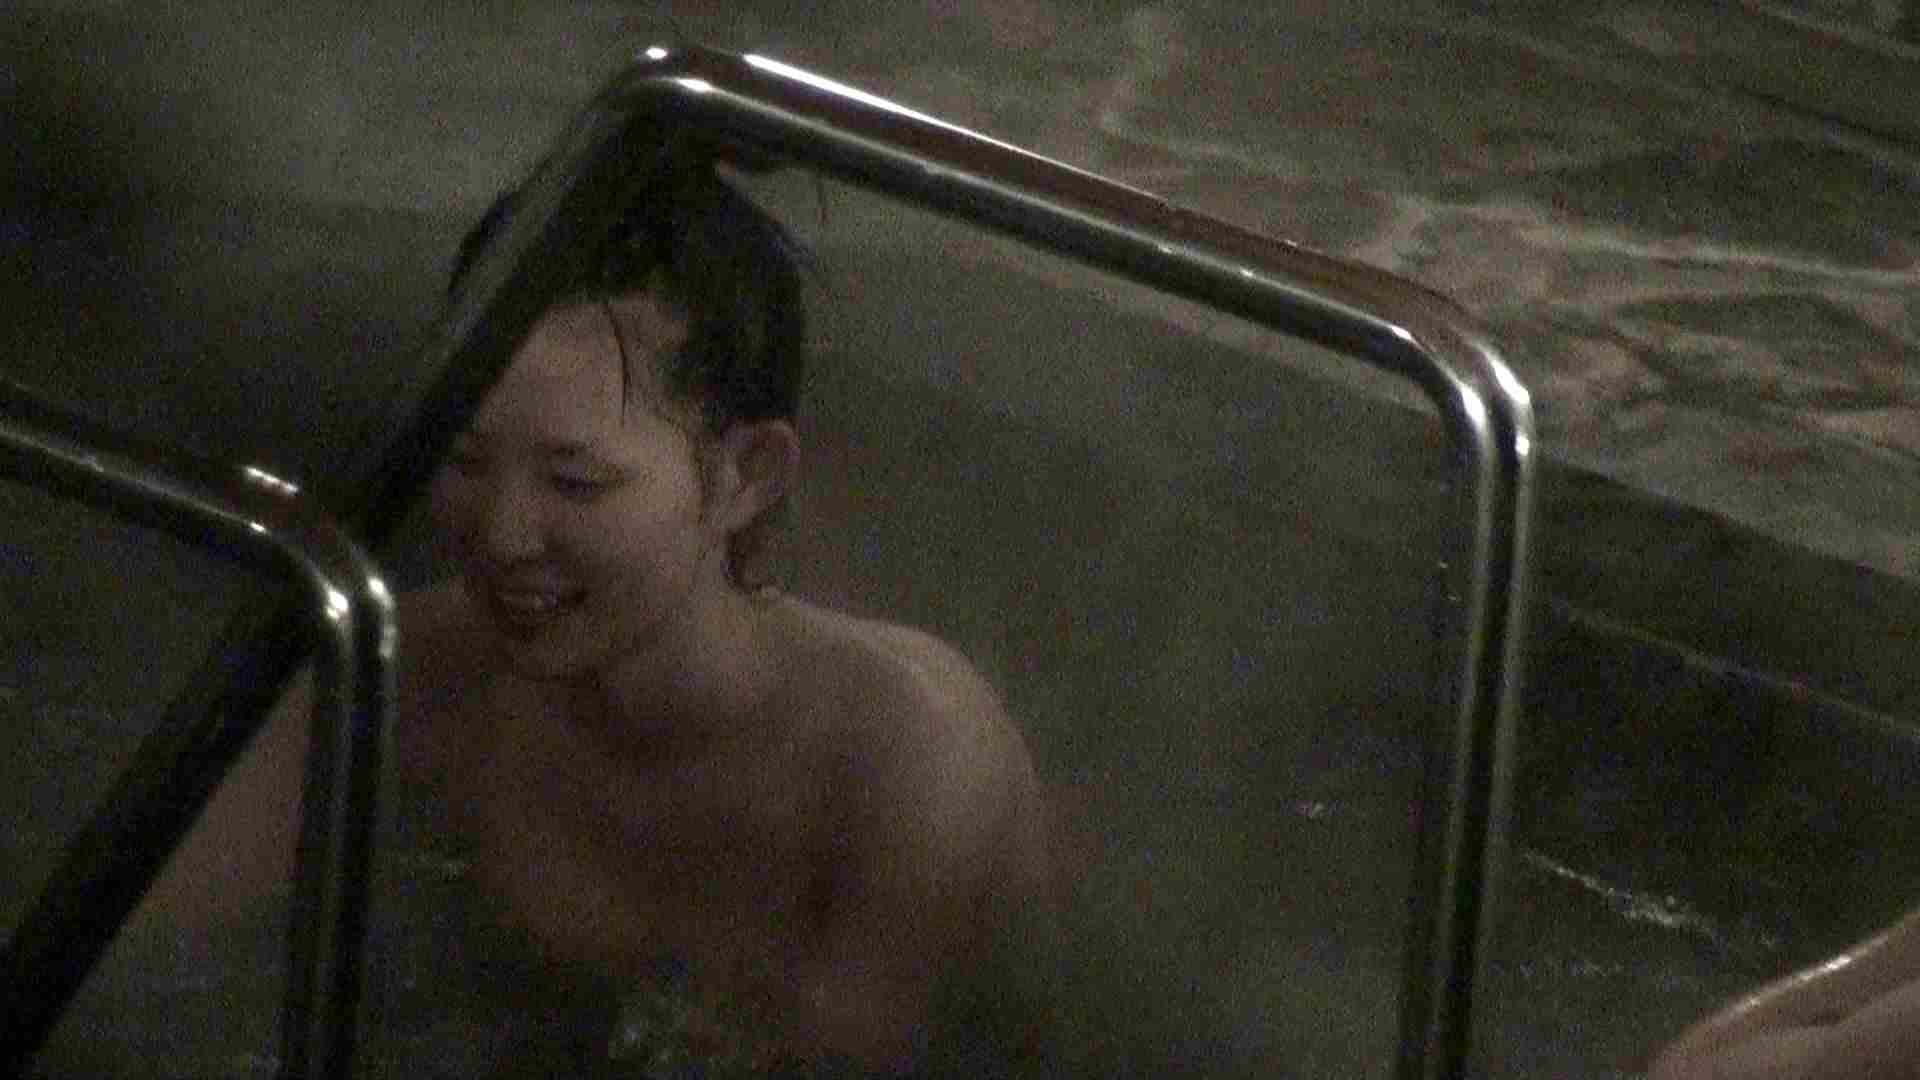 Aquaな露天風呂Vol.363 盗撮 | OLセックス  90画像 28